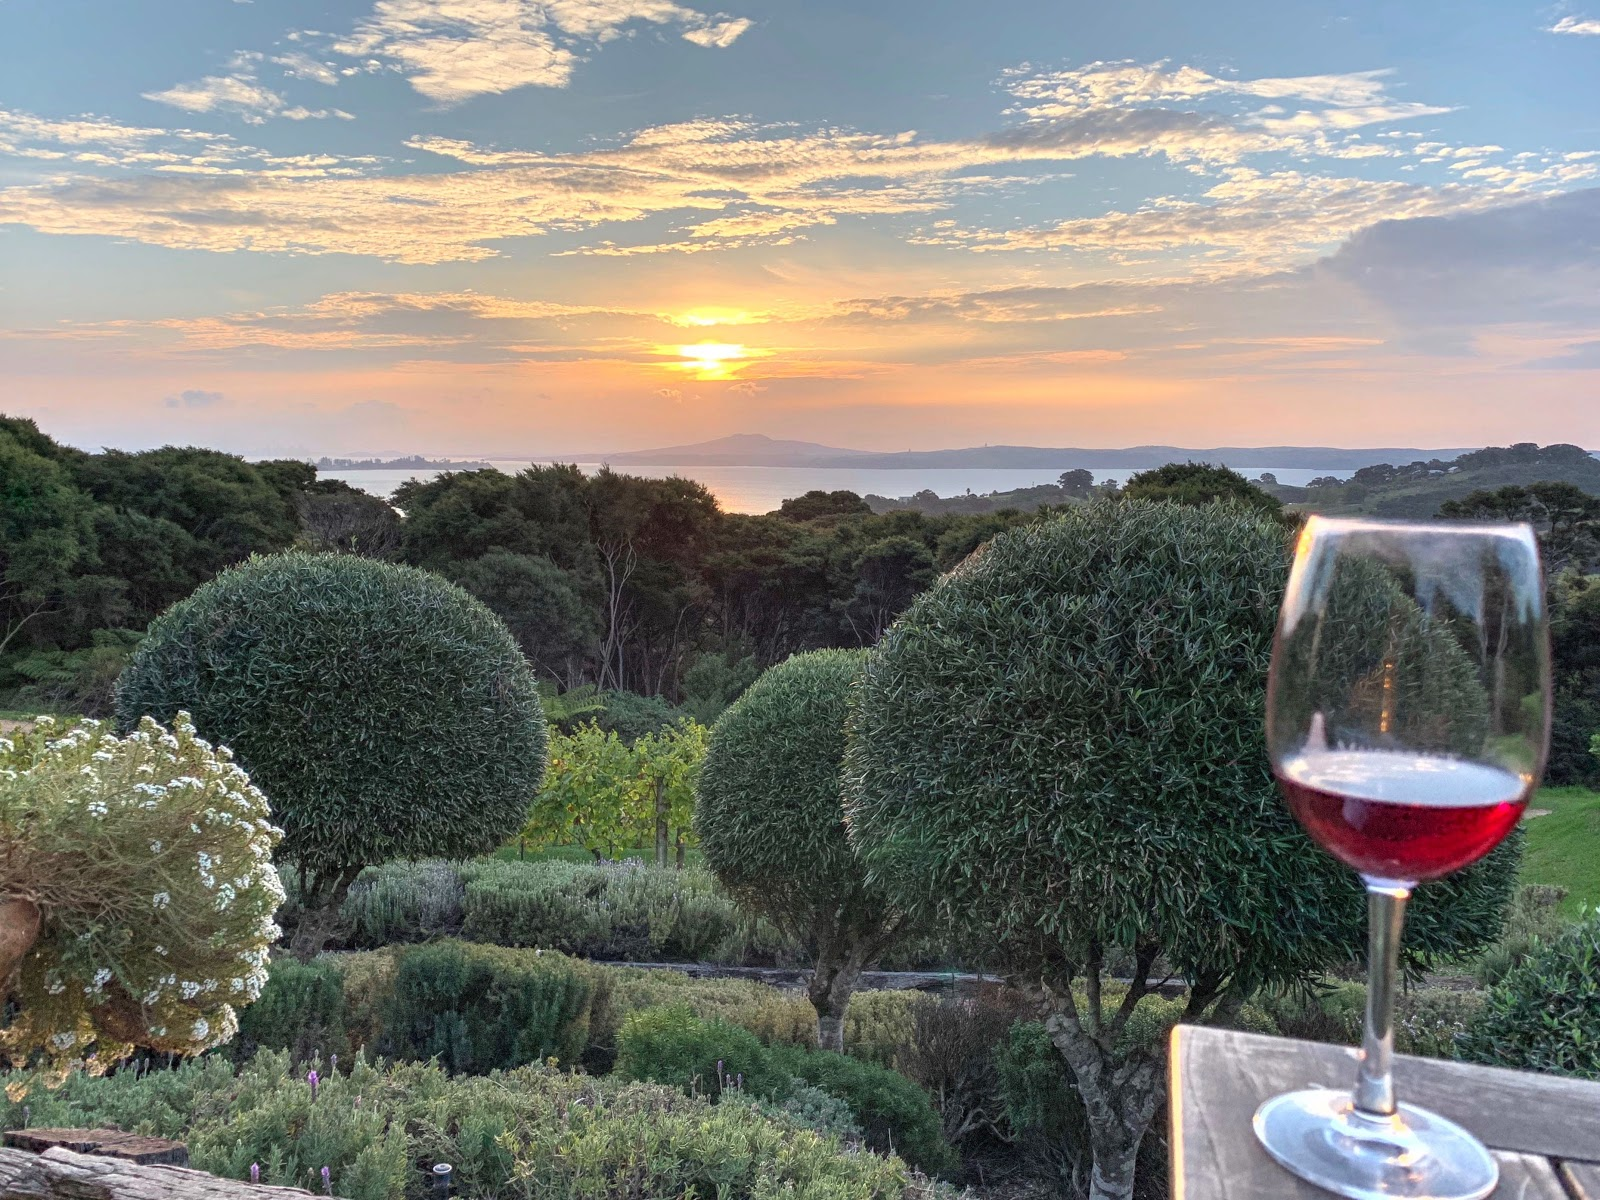 Trips to Auror's New Zealand office, particularly Waiheke (AKA wine island) are an added bonus!